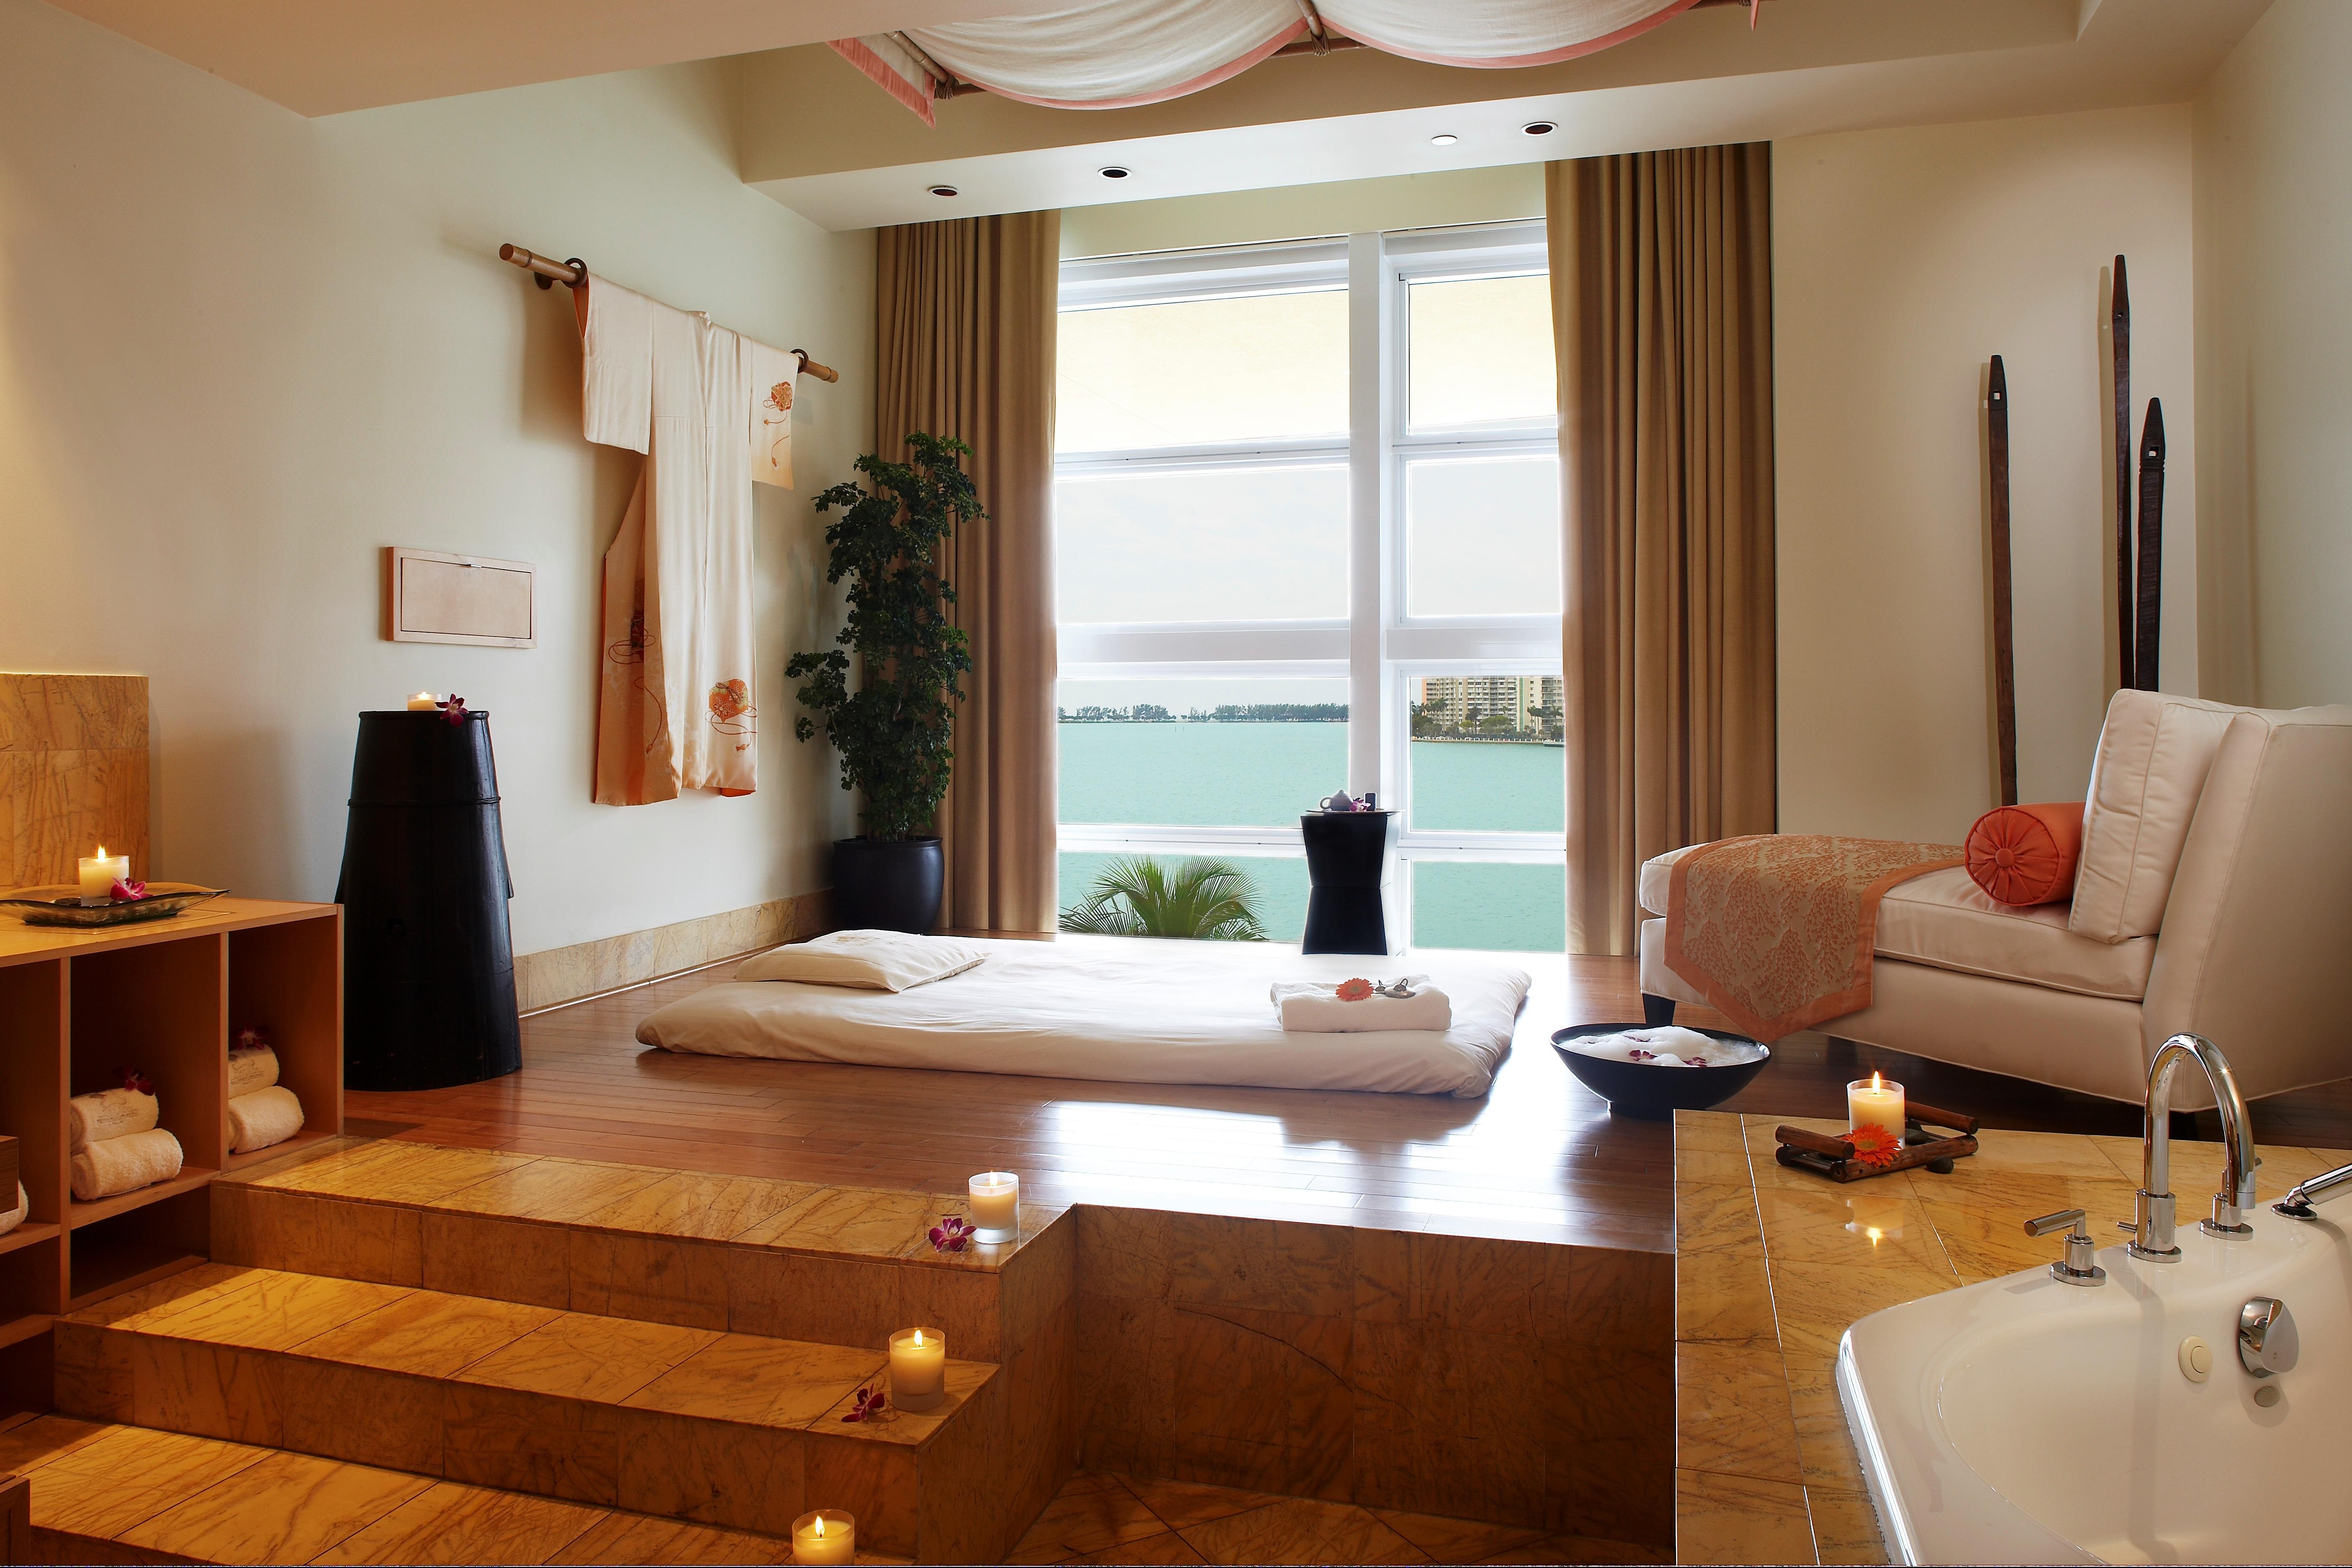 spa bathroom window treatments photo - 2